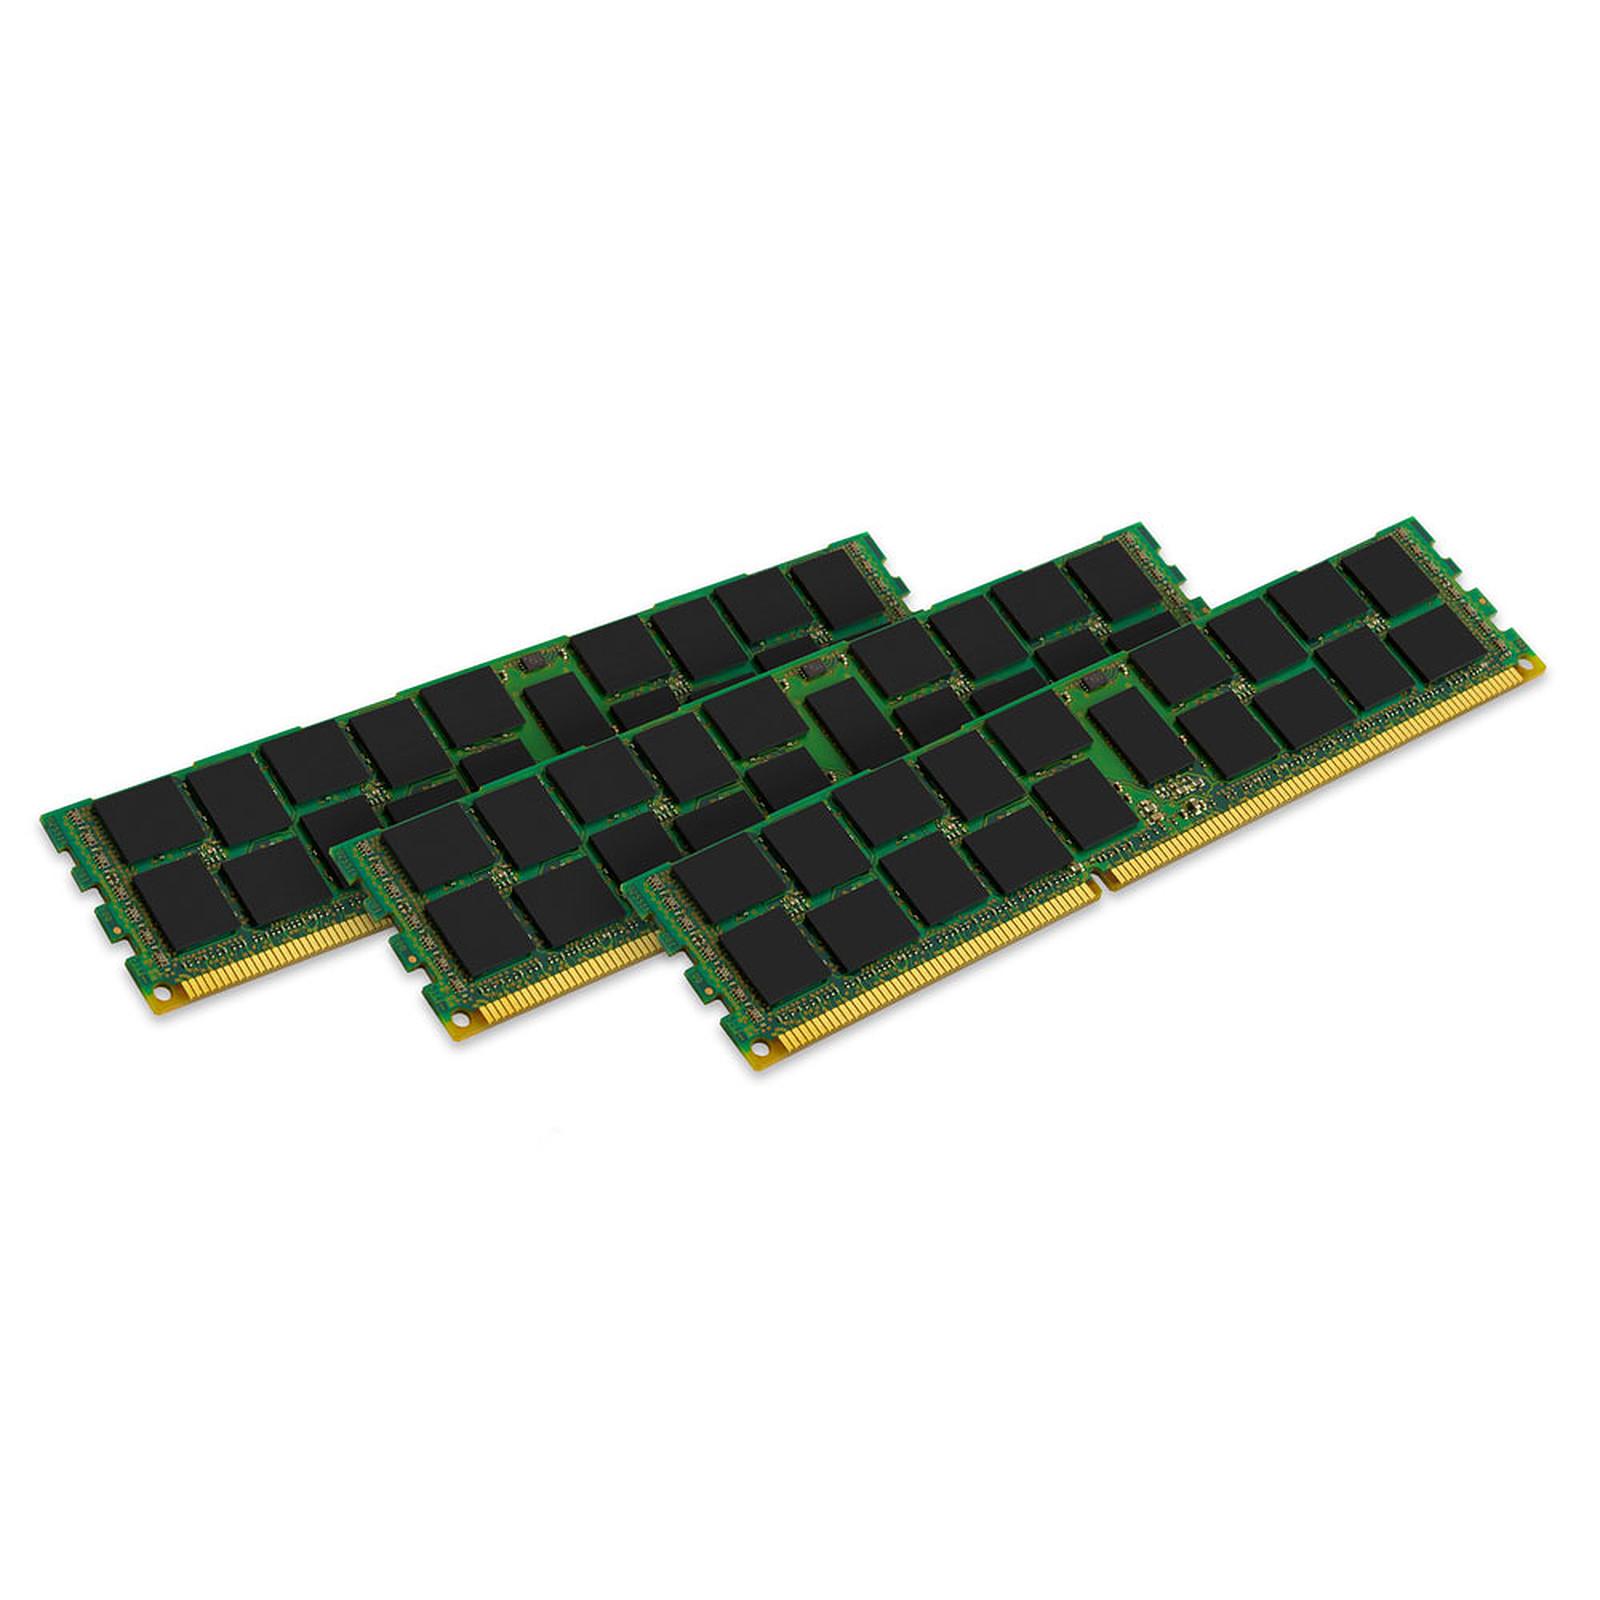 Kingston ValueRAM 12 Go (3 x 4 Go) DDR3 1600 MHz ECC Registered CL11 SR X8 (Intel)